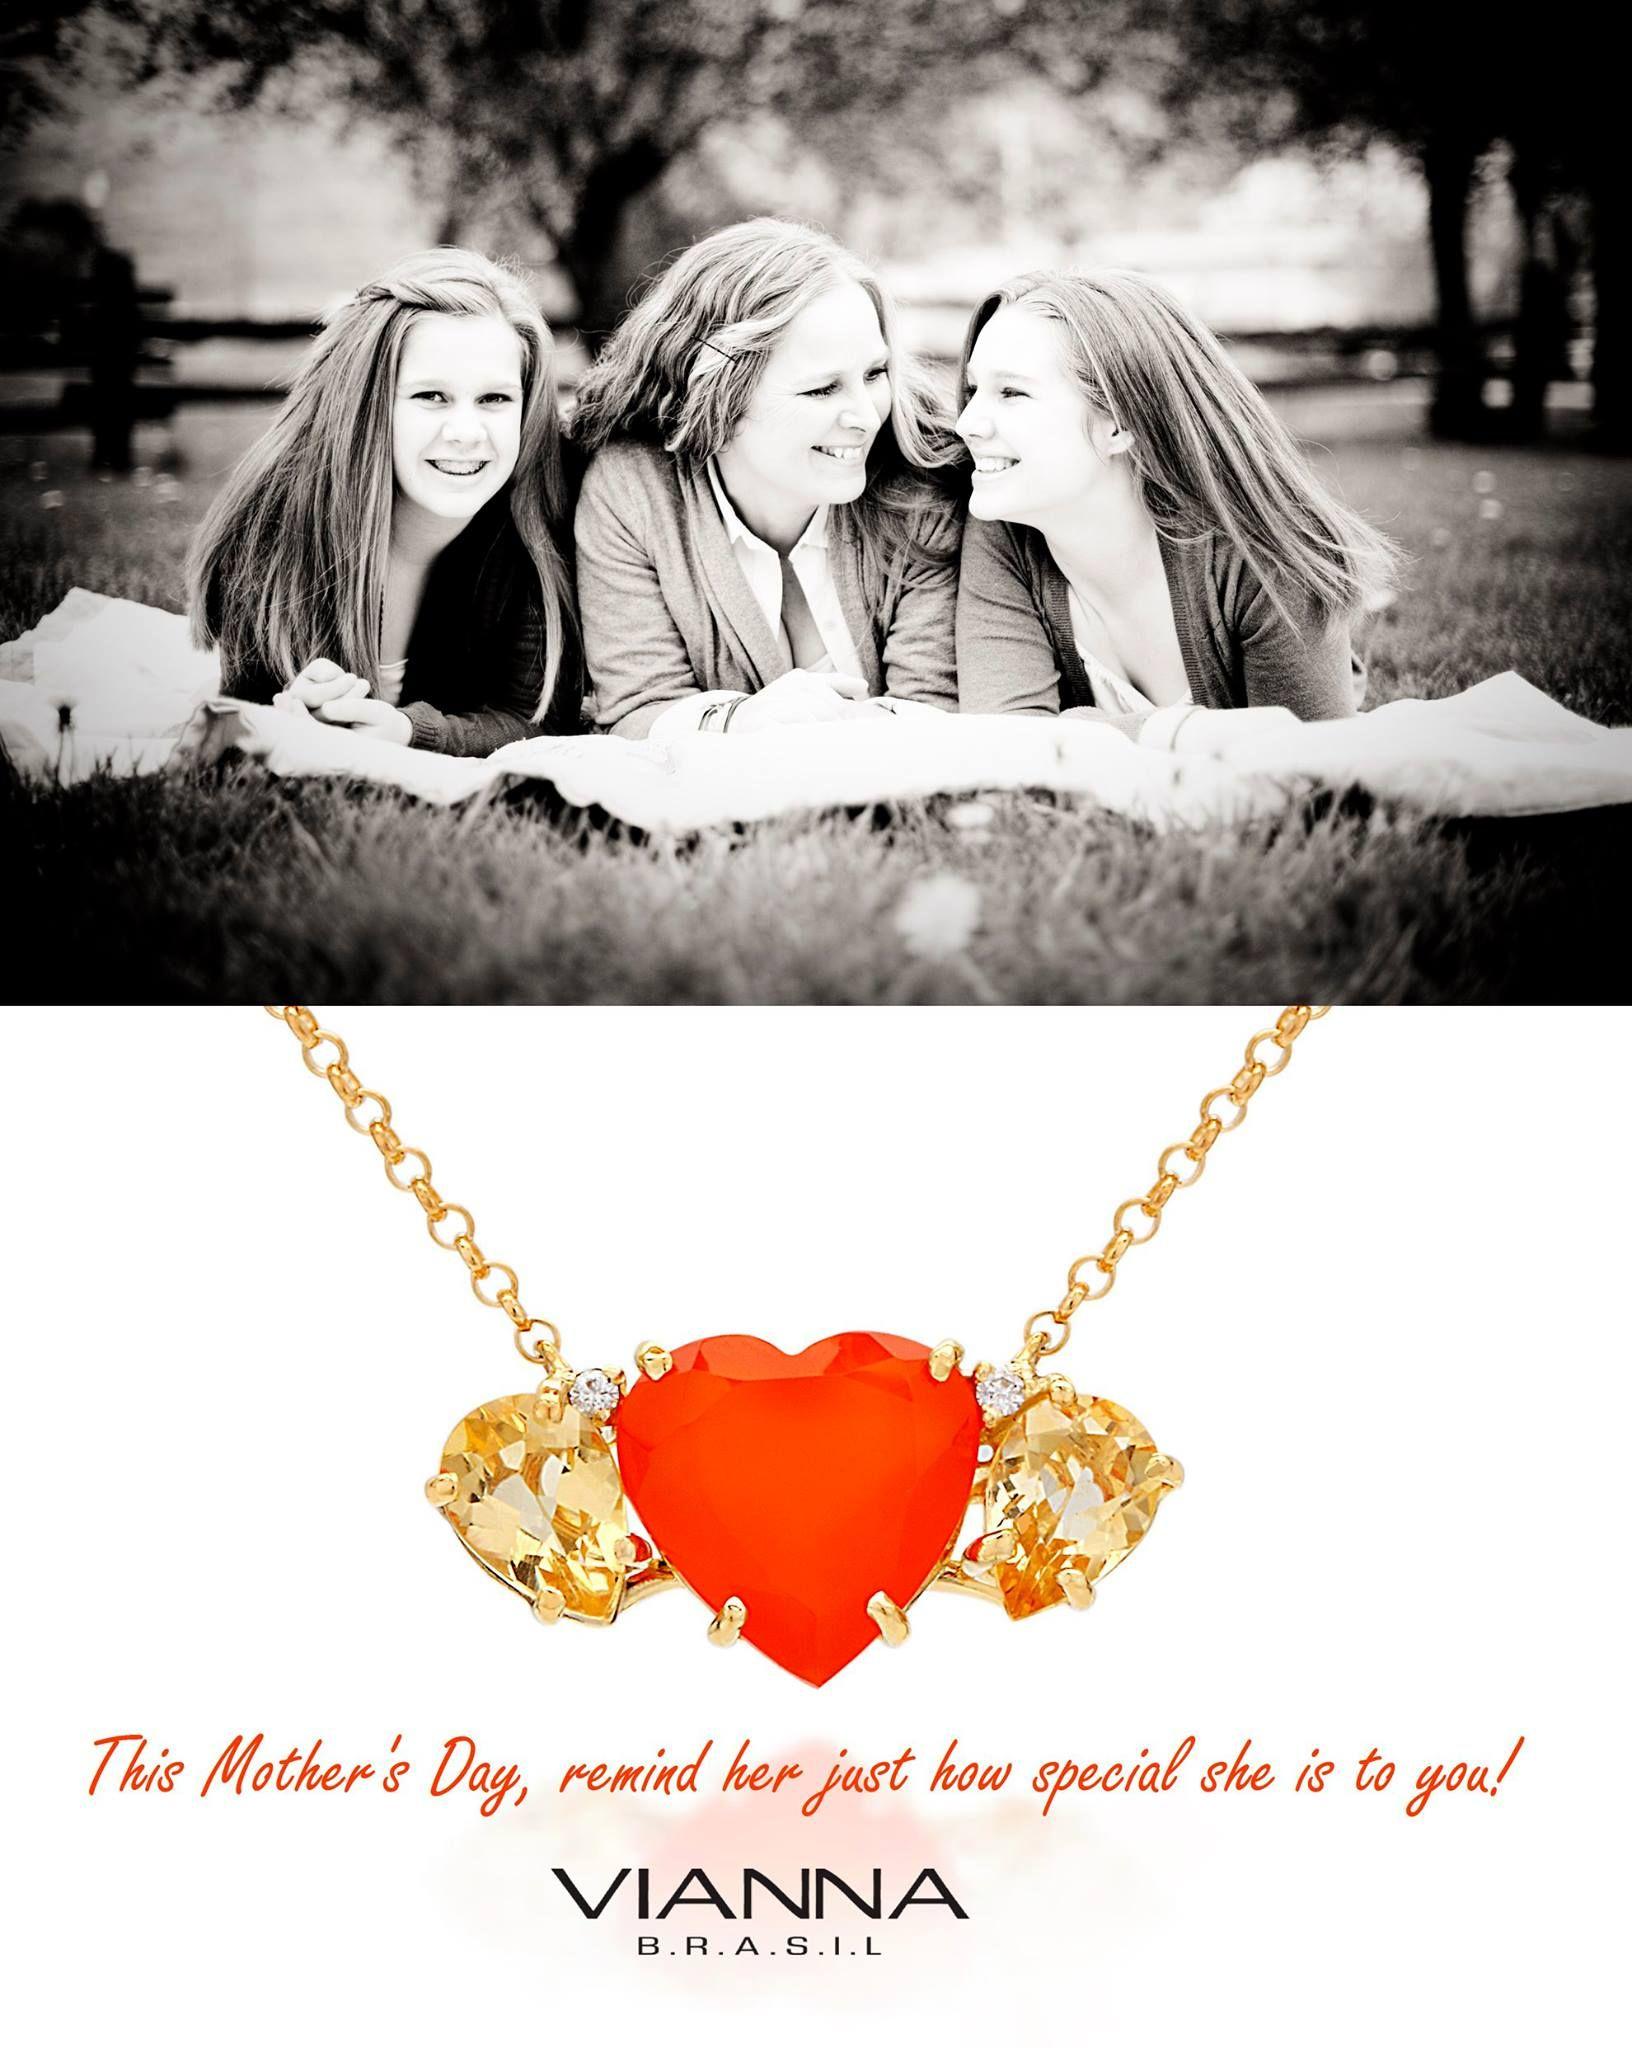 10 Best Mothers Day At VIANNA BRASIL Images On Pinterest